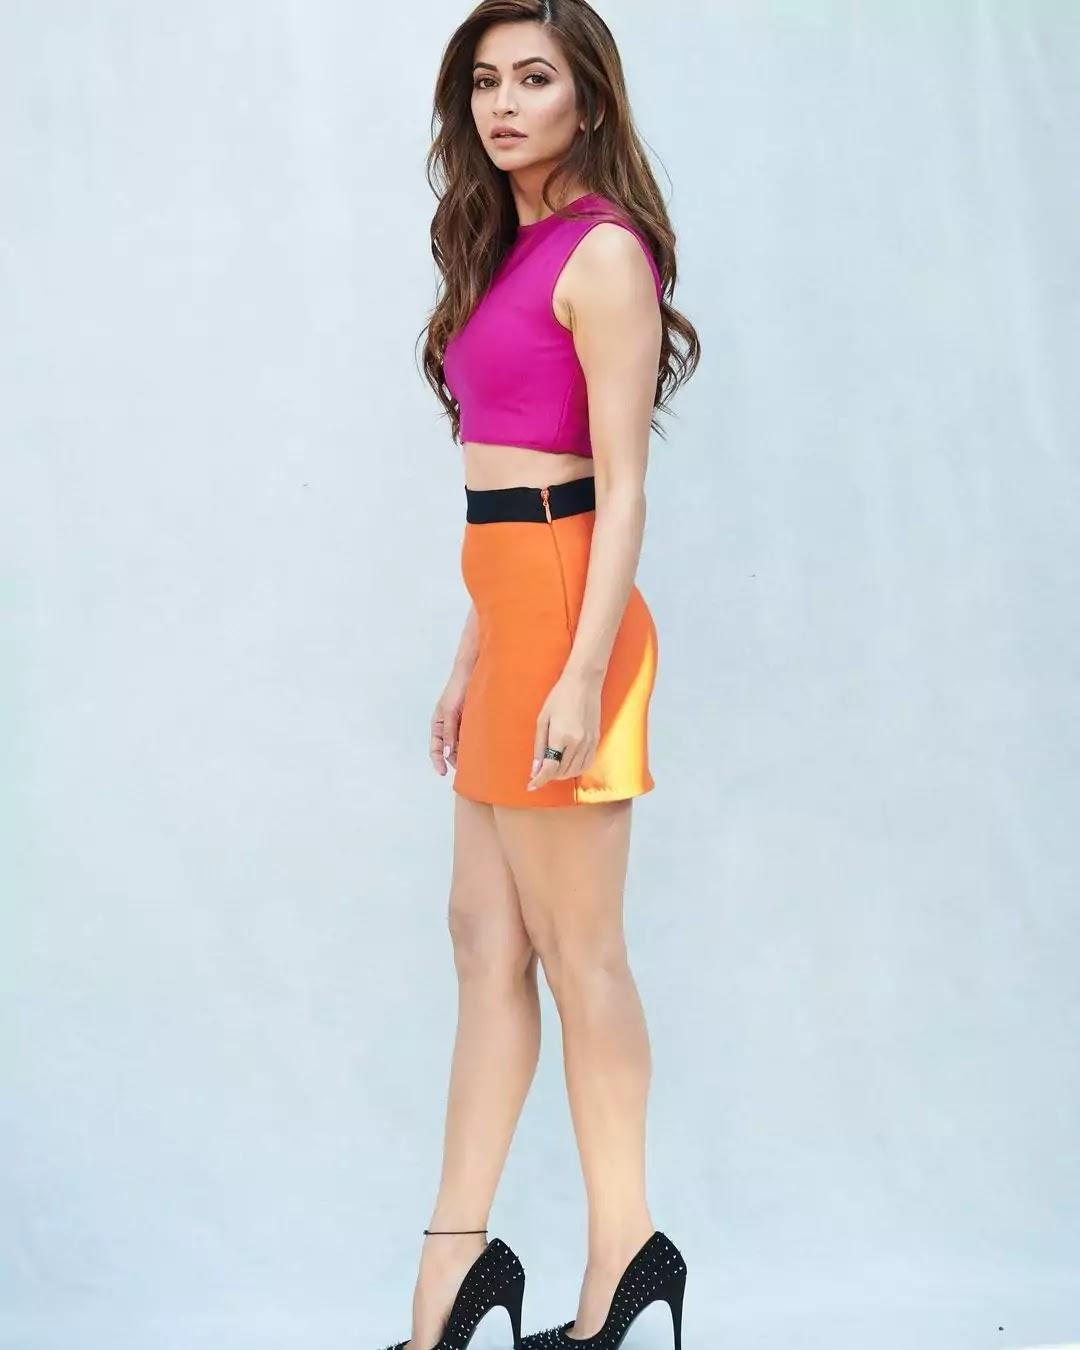 kriti-kharbhanda-hot-looks-in-pink-top-and-orange-mini-skirt